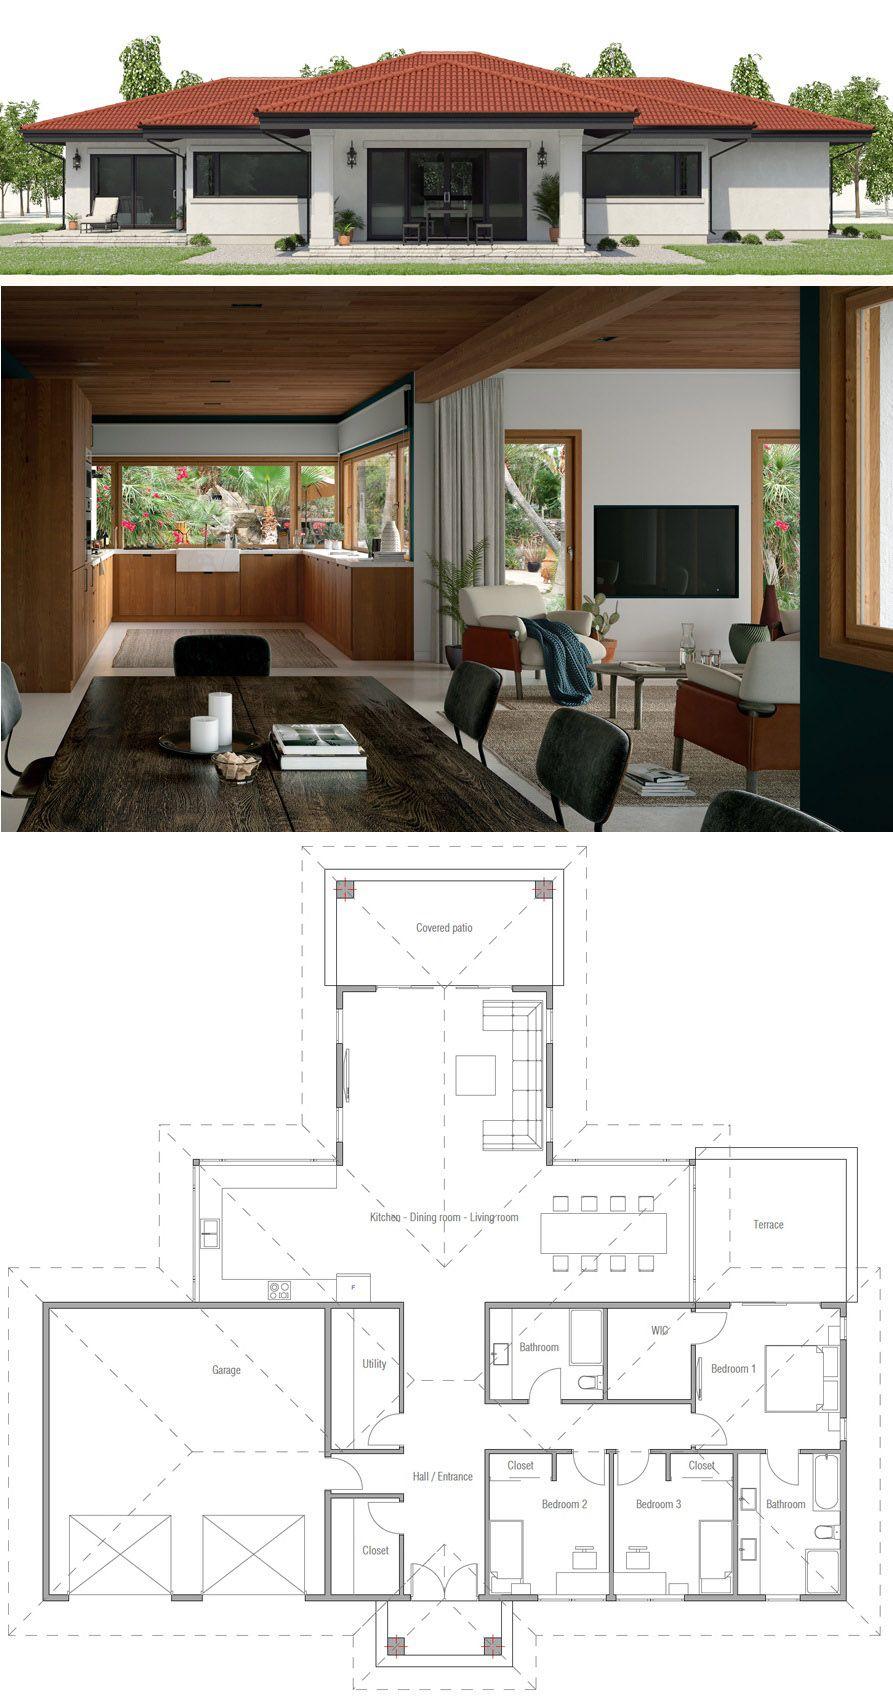 House design home plan floor housedesign houseplans floorplans newhomeplans also rh pinterest